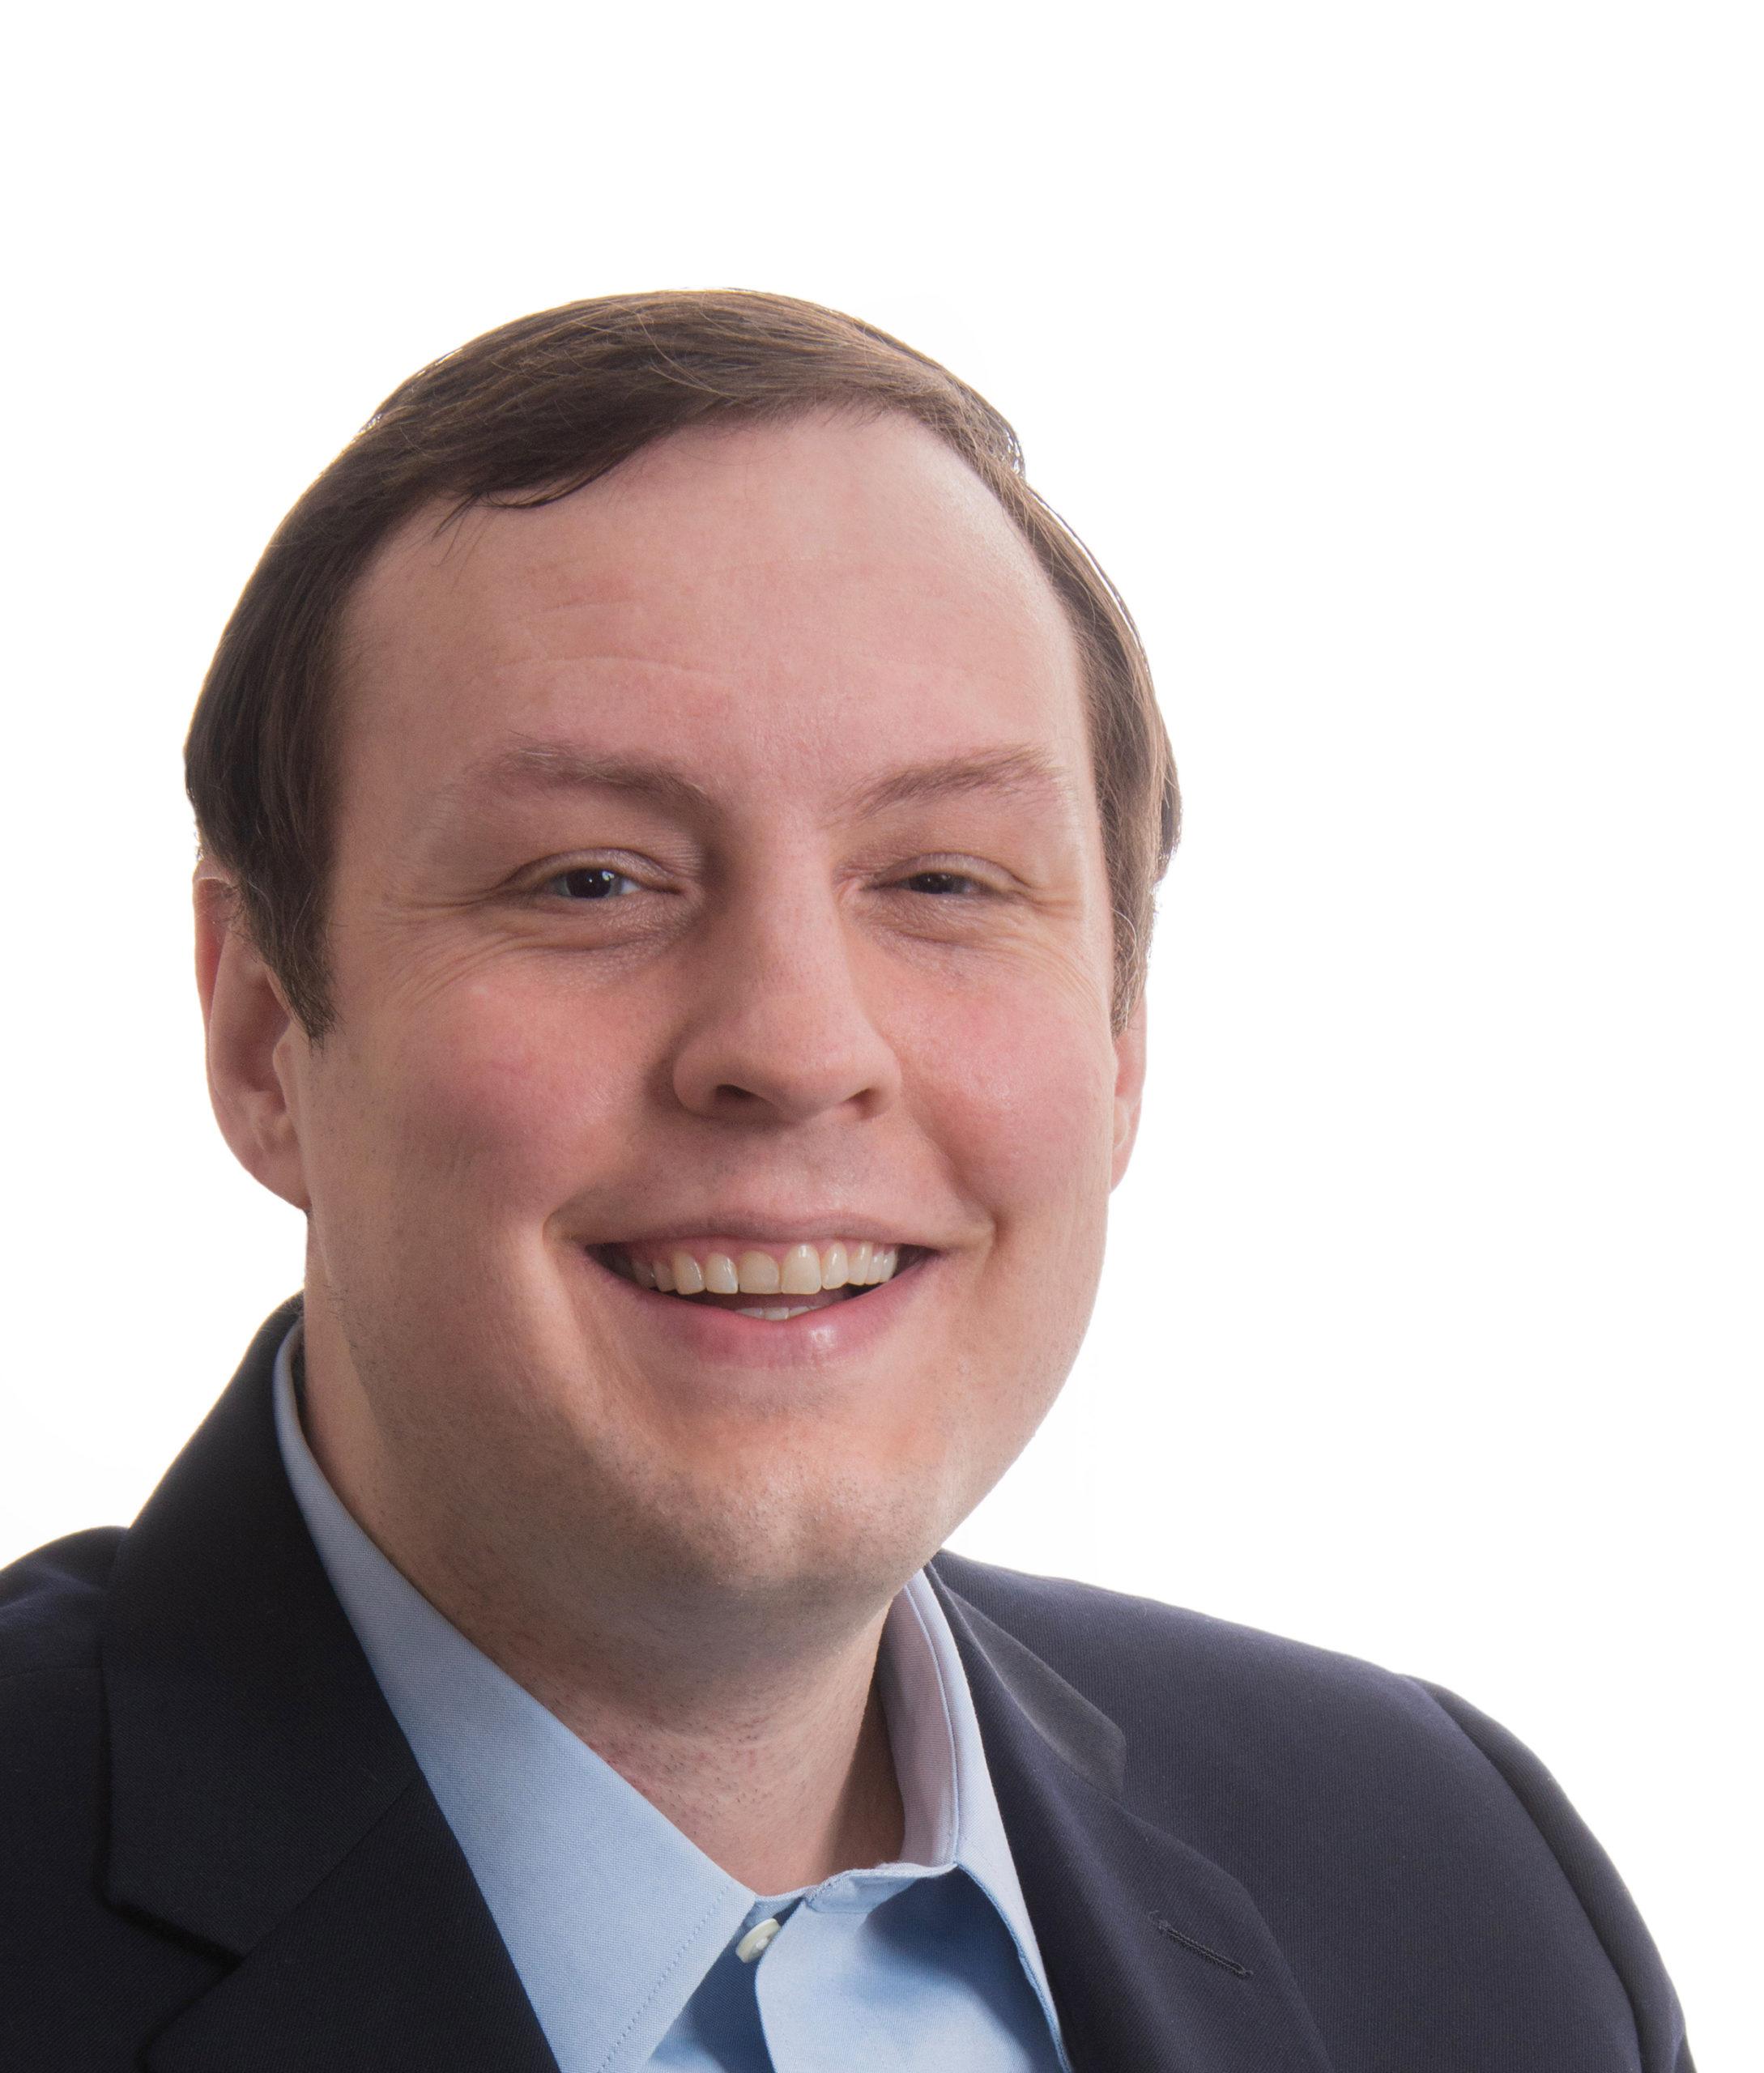 Andrew henkel, CIO of FI Works